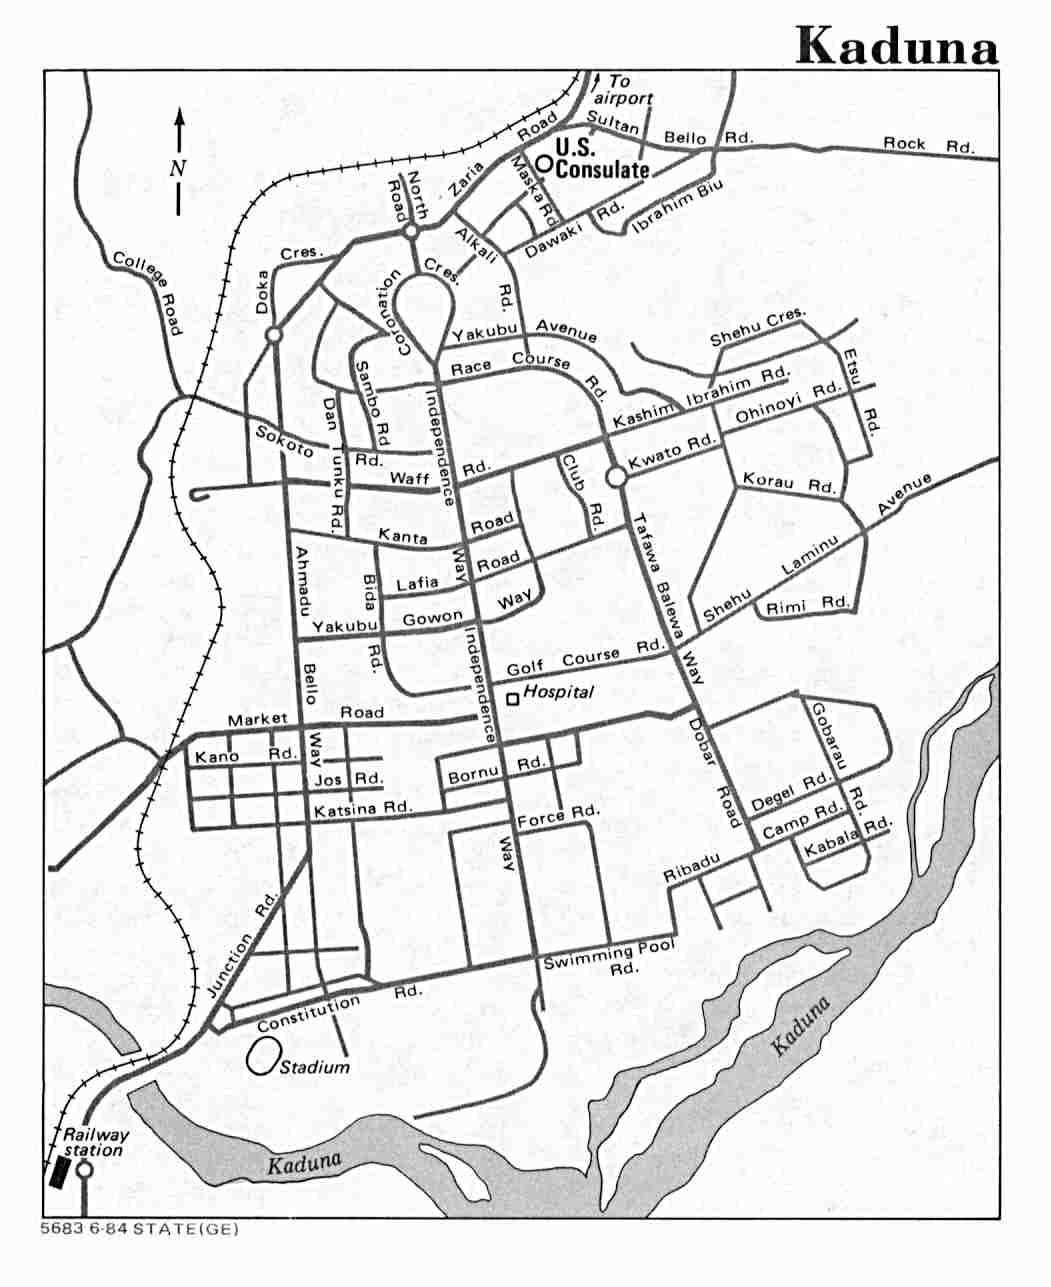 Mapa de la Ciudad de Kaduna, Nigeria